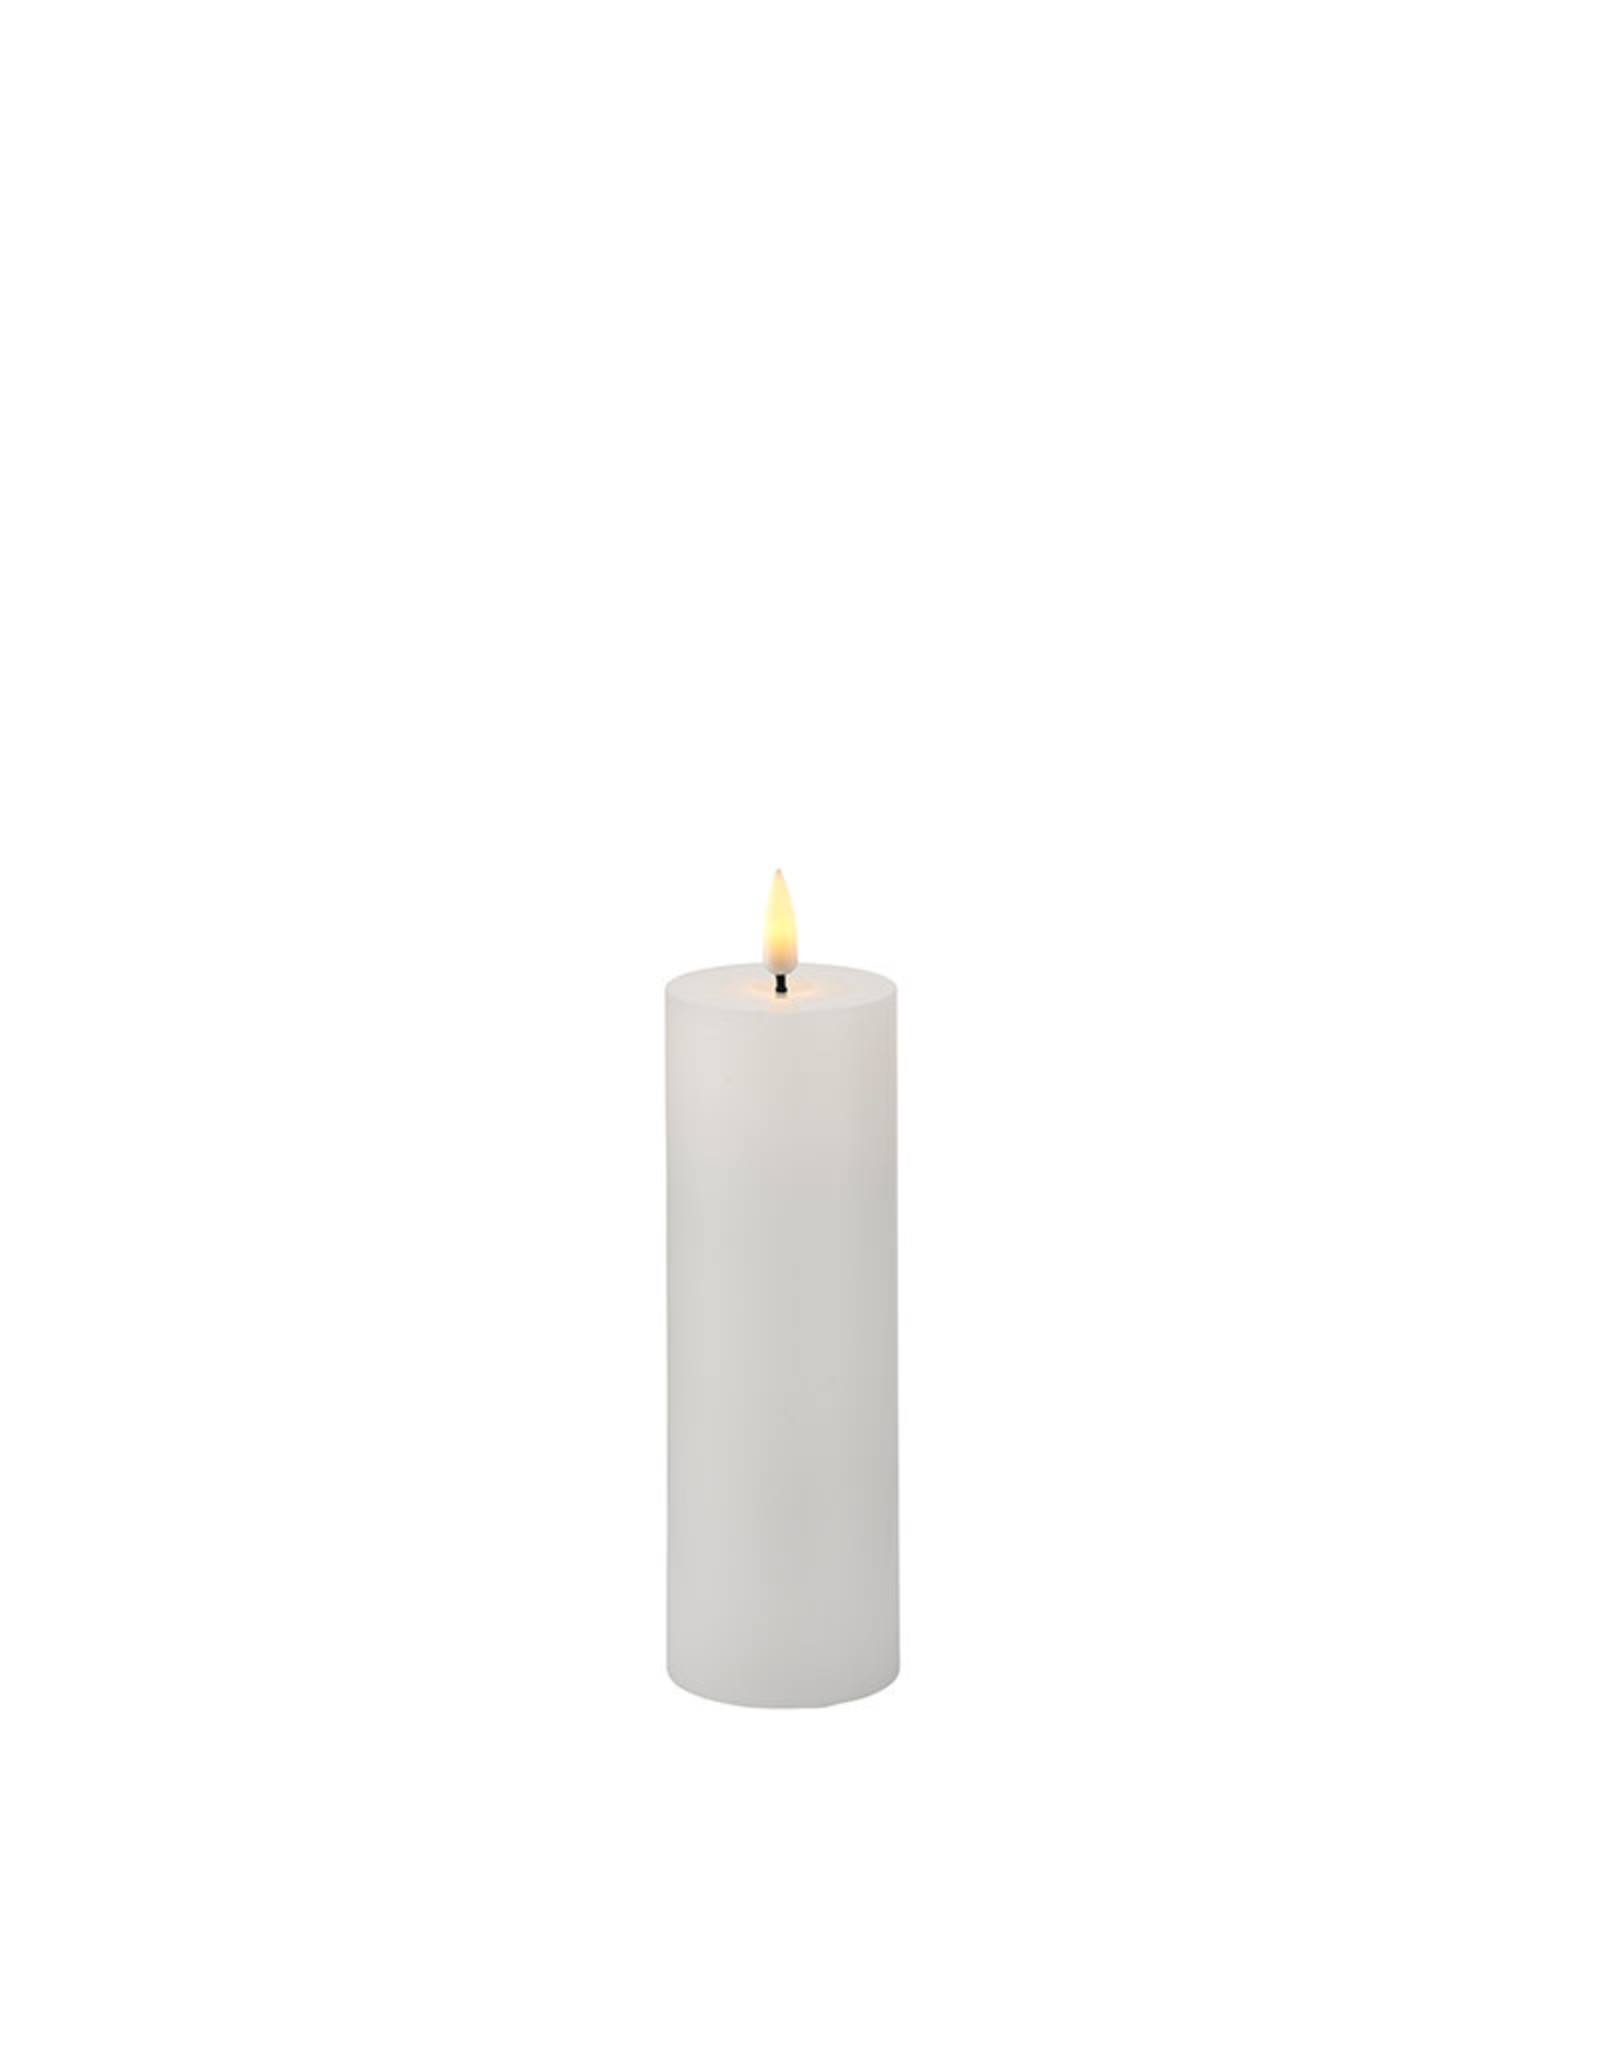 SIRIUS SIRIUS SILLE LED CANDLE Ø5 x H15